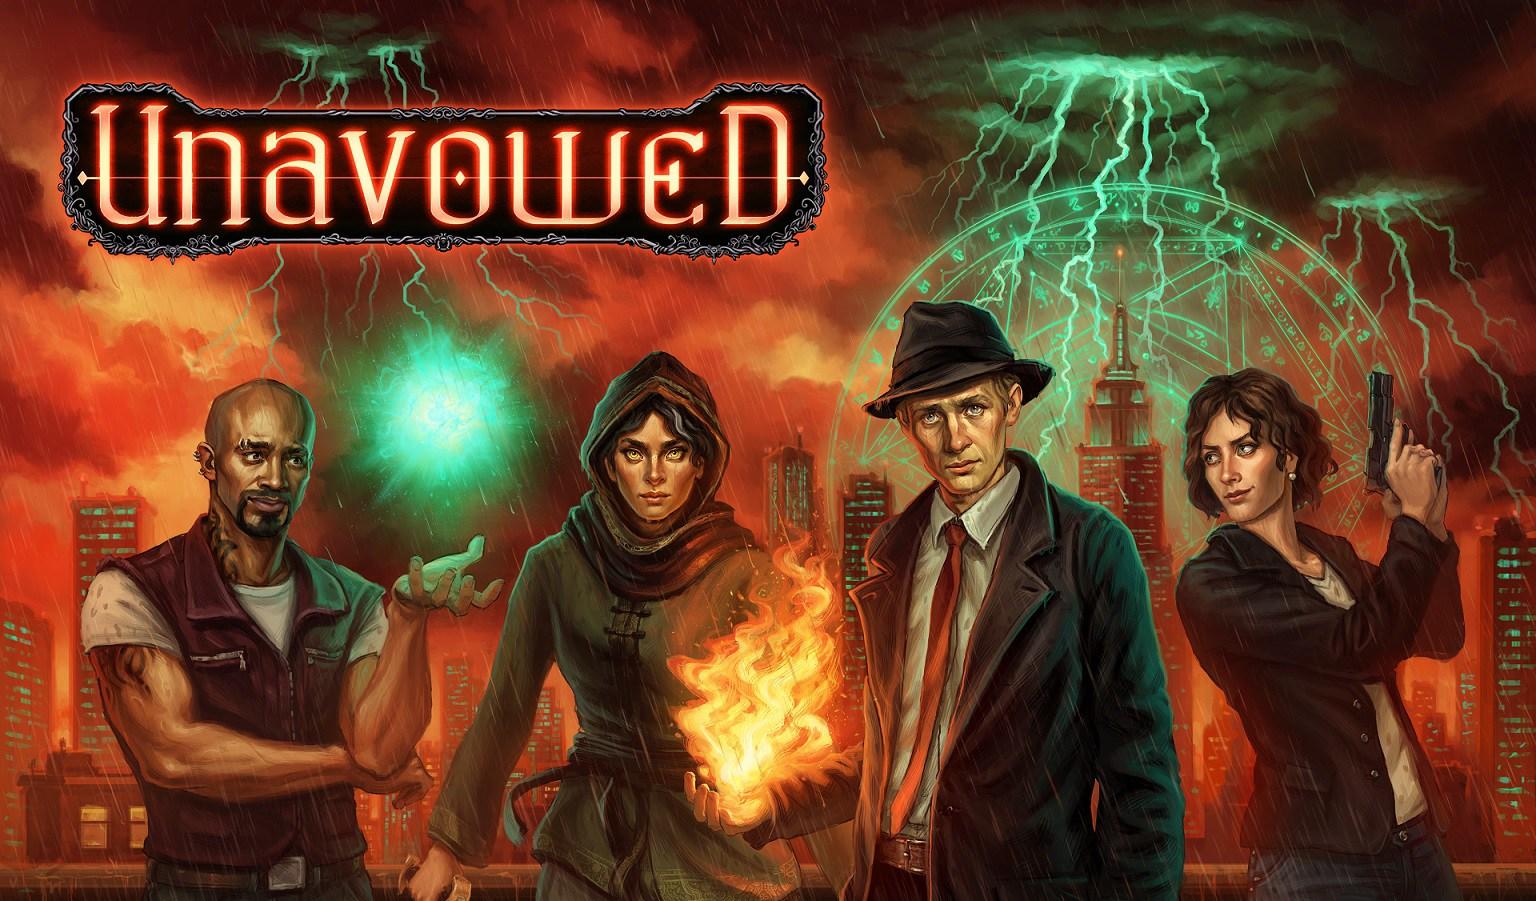 Nicho em destaque - Unavowed: Throwback Supernatural Adventure